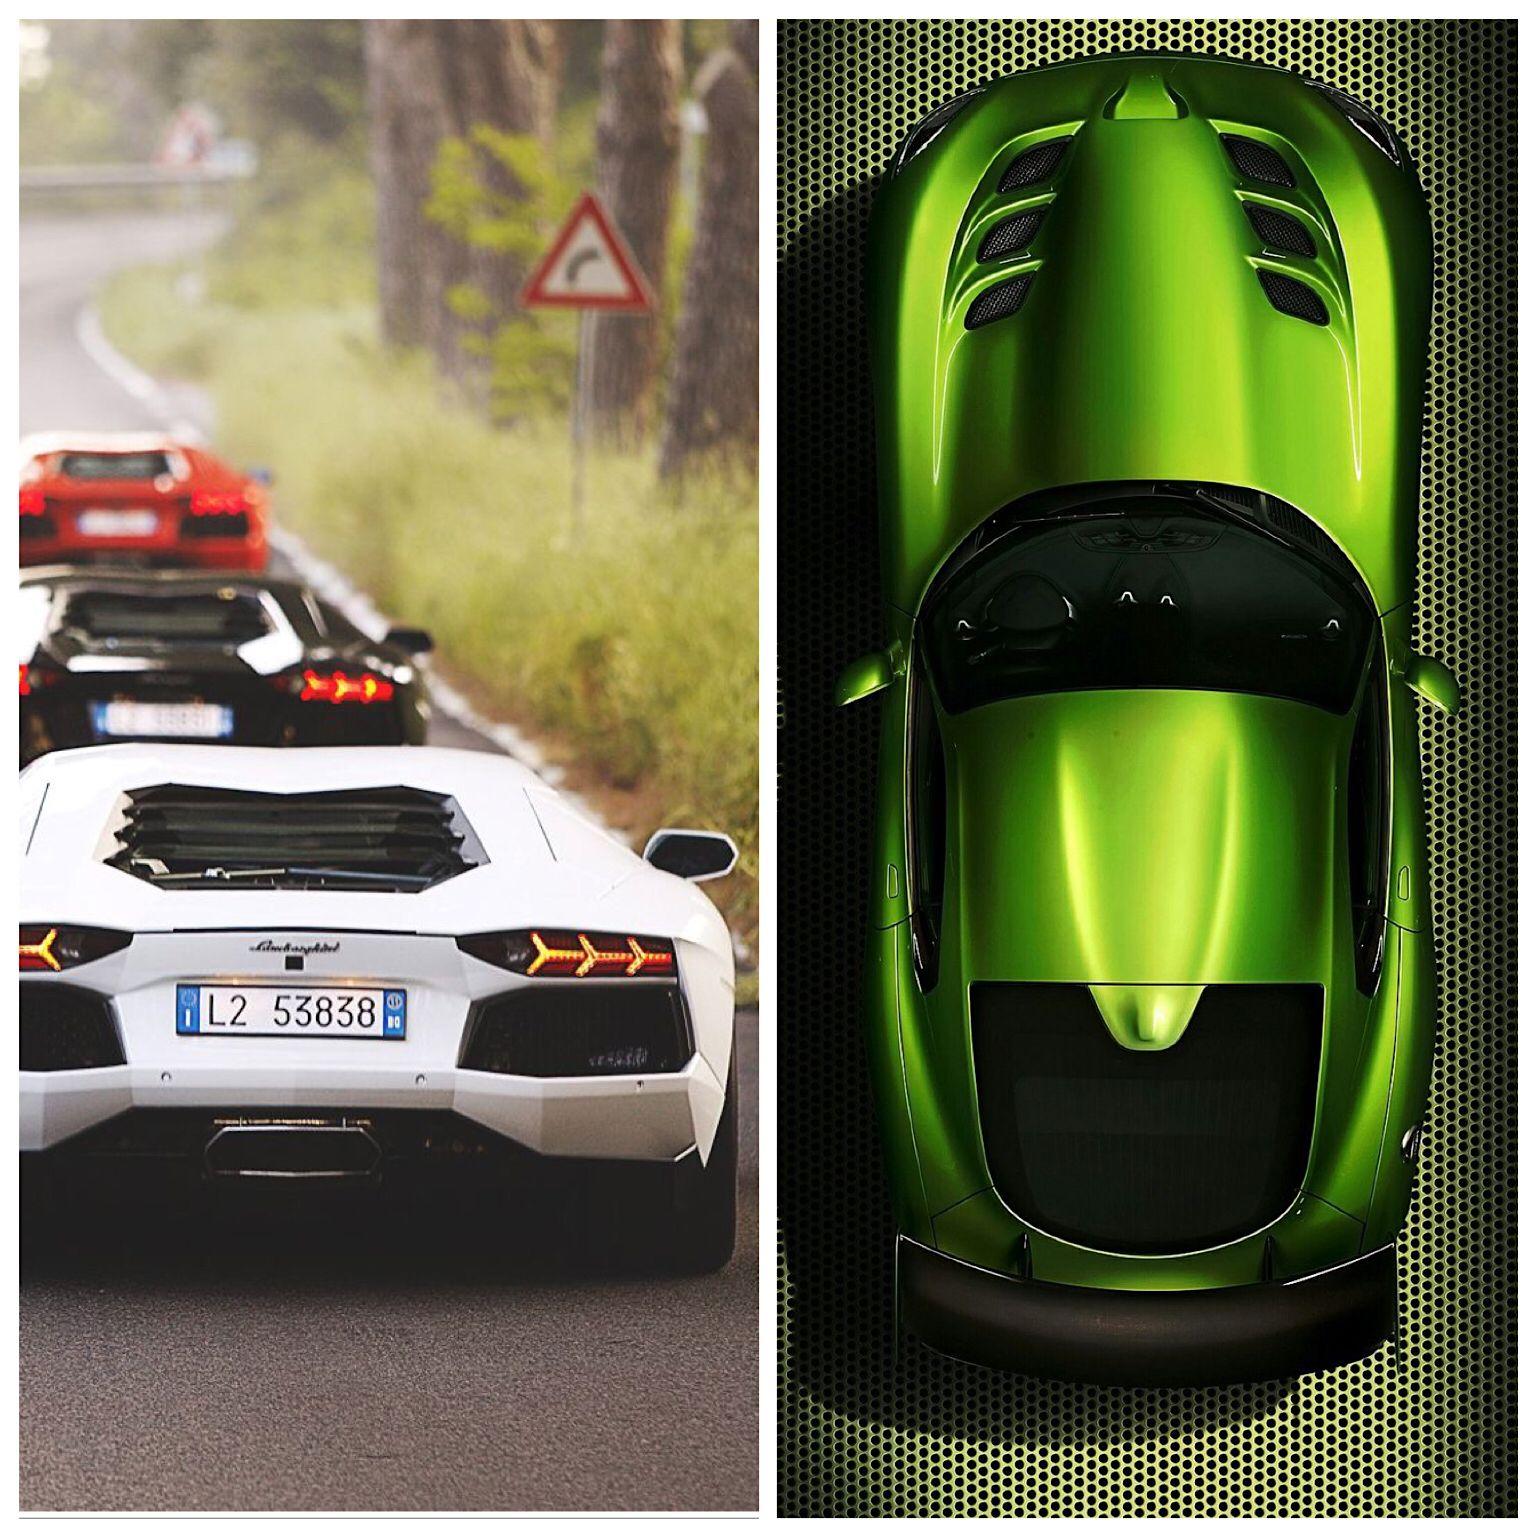 Supercars Supermodels Pangels Best Mix Www Instagram Com Pangels Best Super Cars Instagram Supermodels